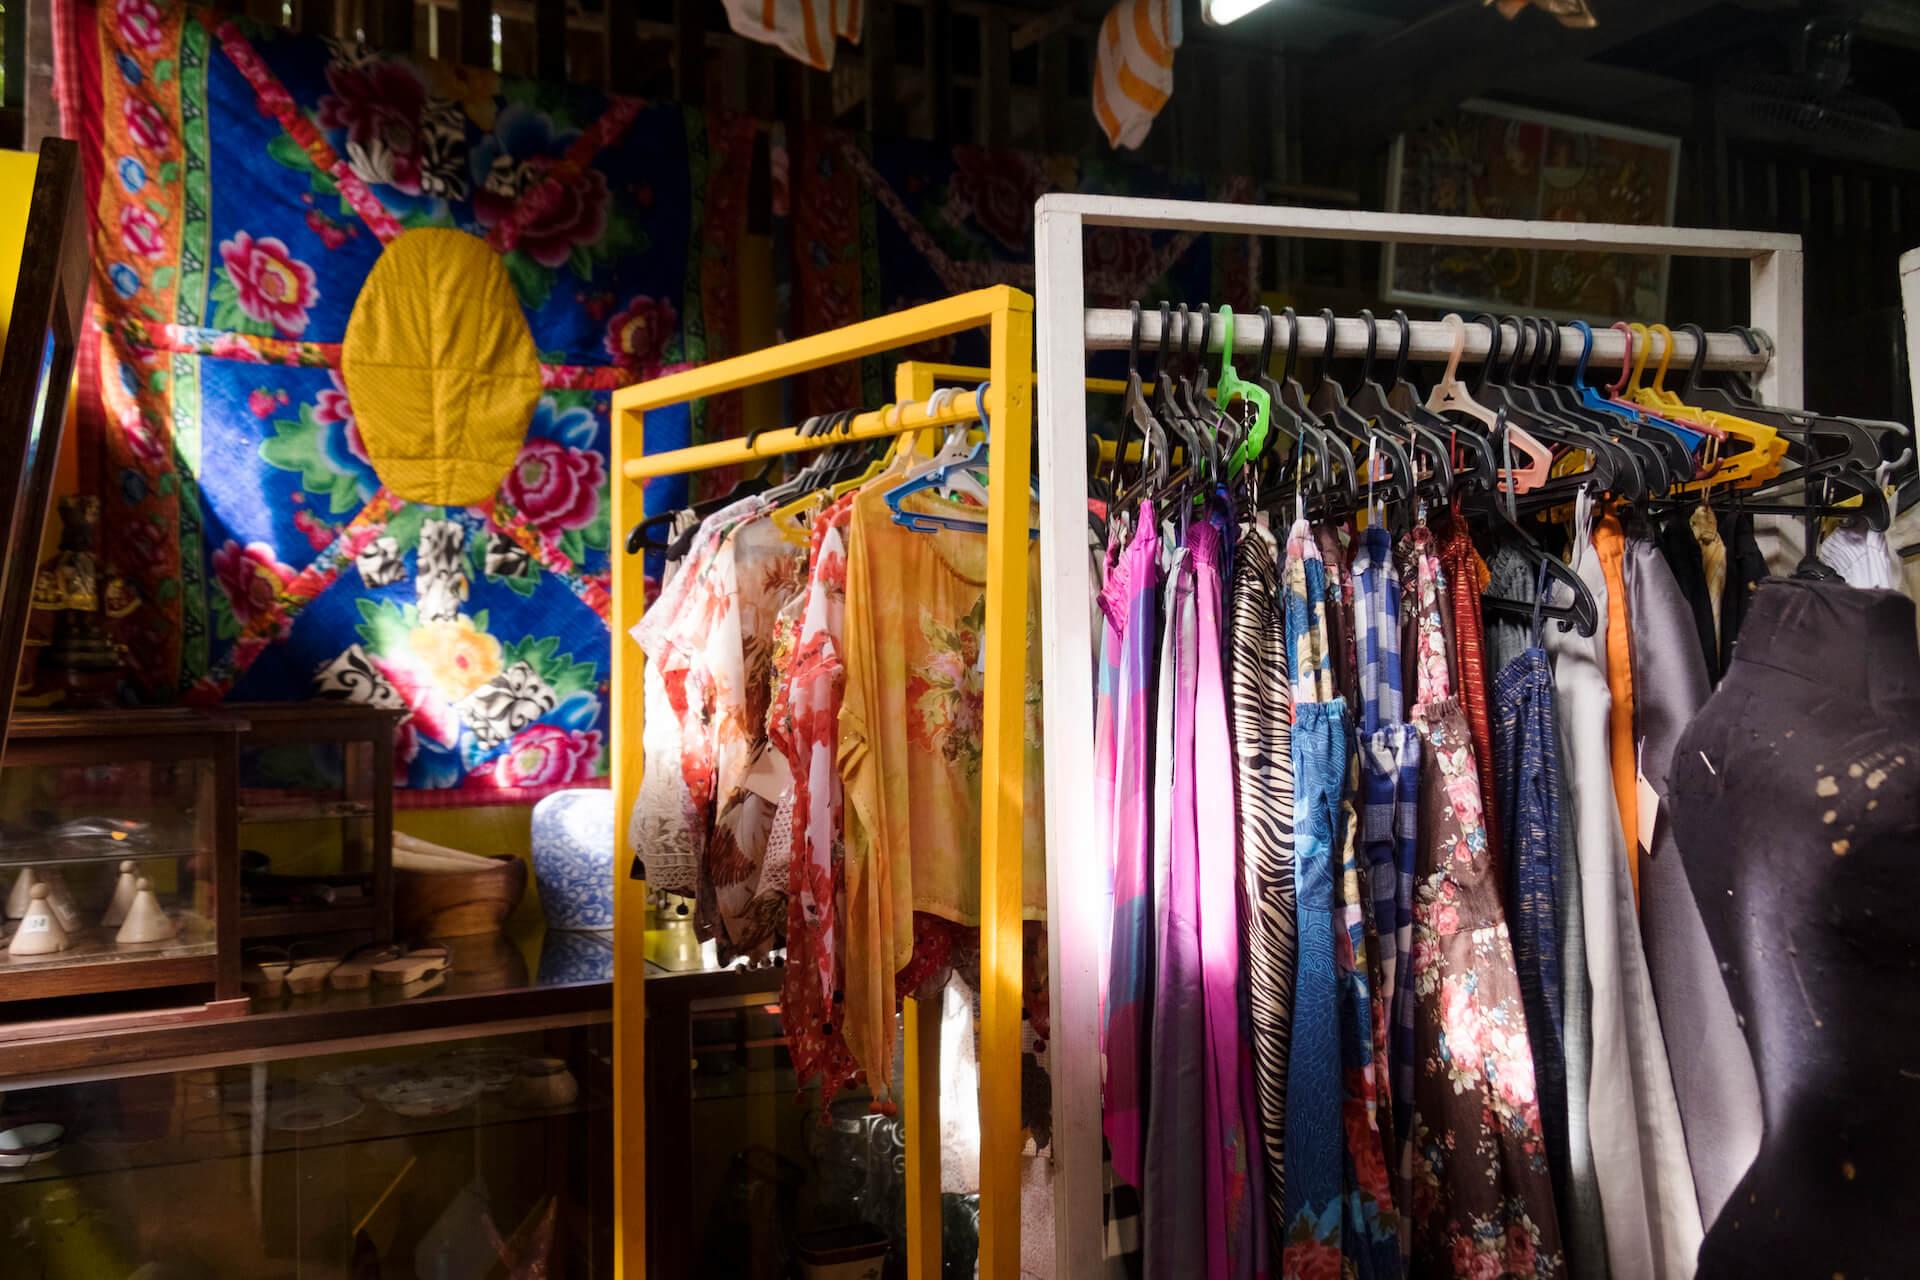 Rack of clothes in Patis Tesoro's B&B